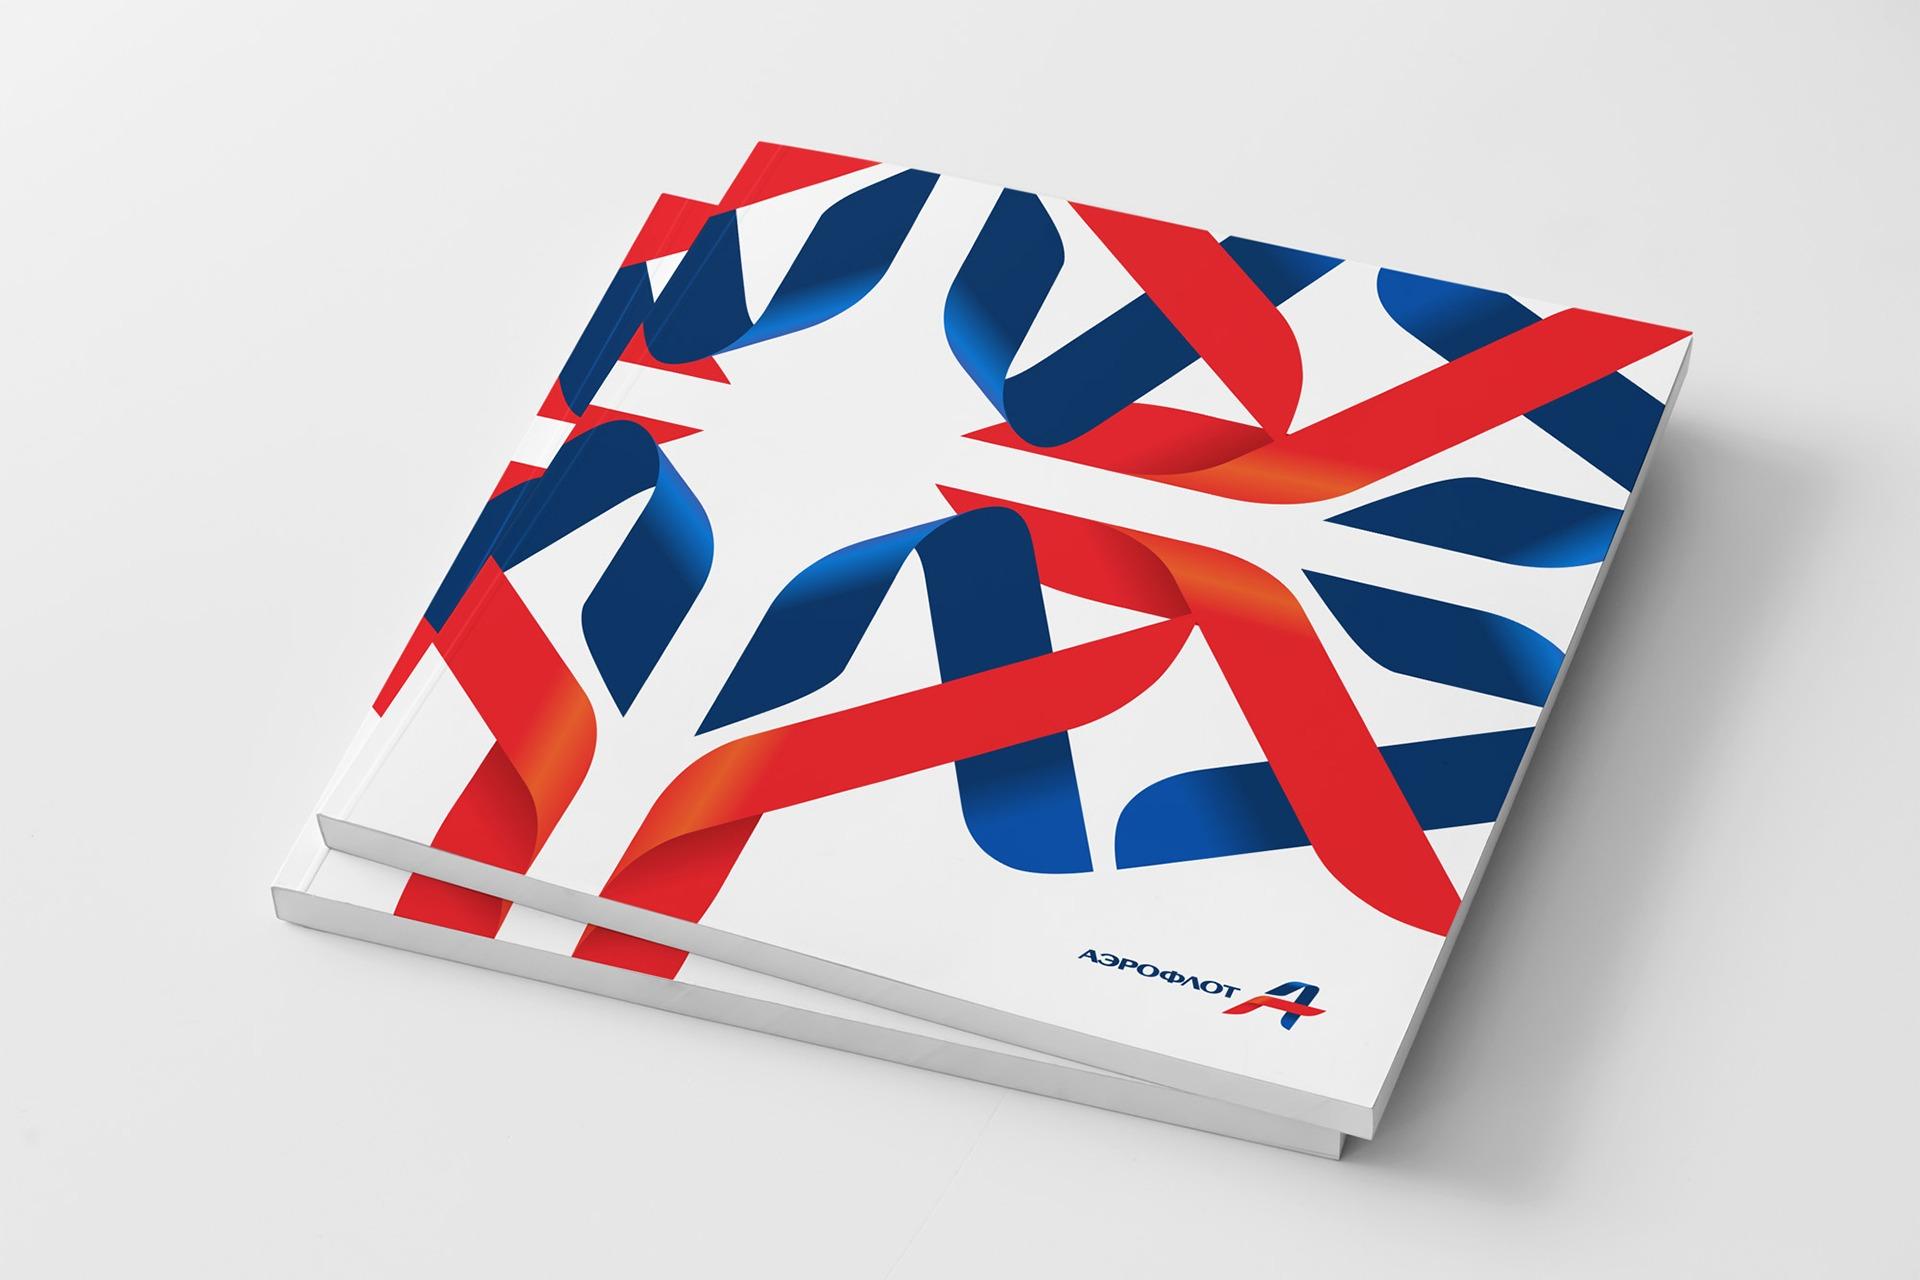 Фирменный стиль Аэрофлот, , re-branding, ребрендинг авиакомпании, Asgard Branding, Асгард, лого Аэрофлот, Aeroflot, airlines, branding, book